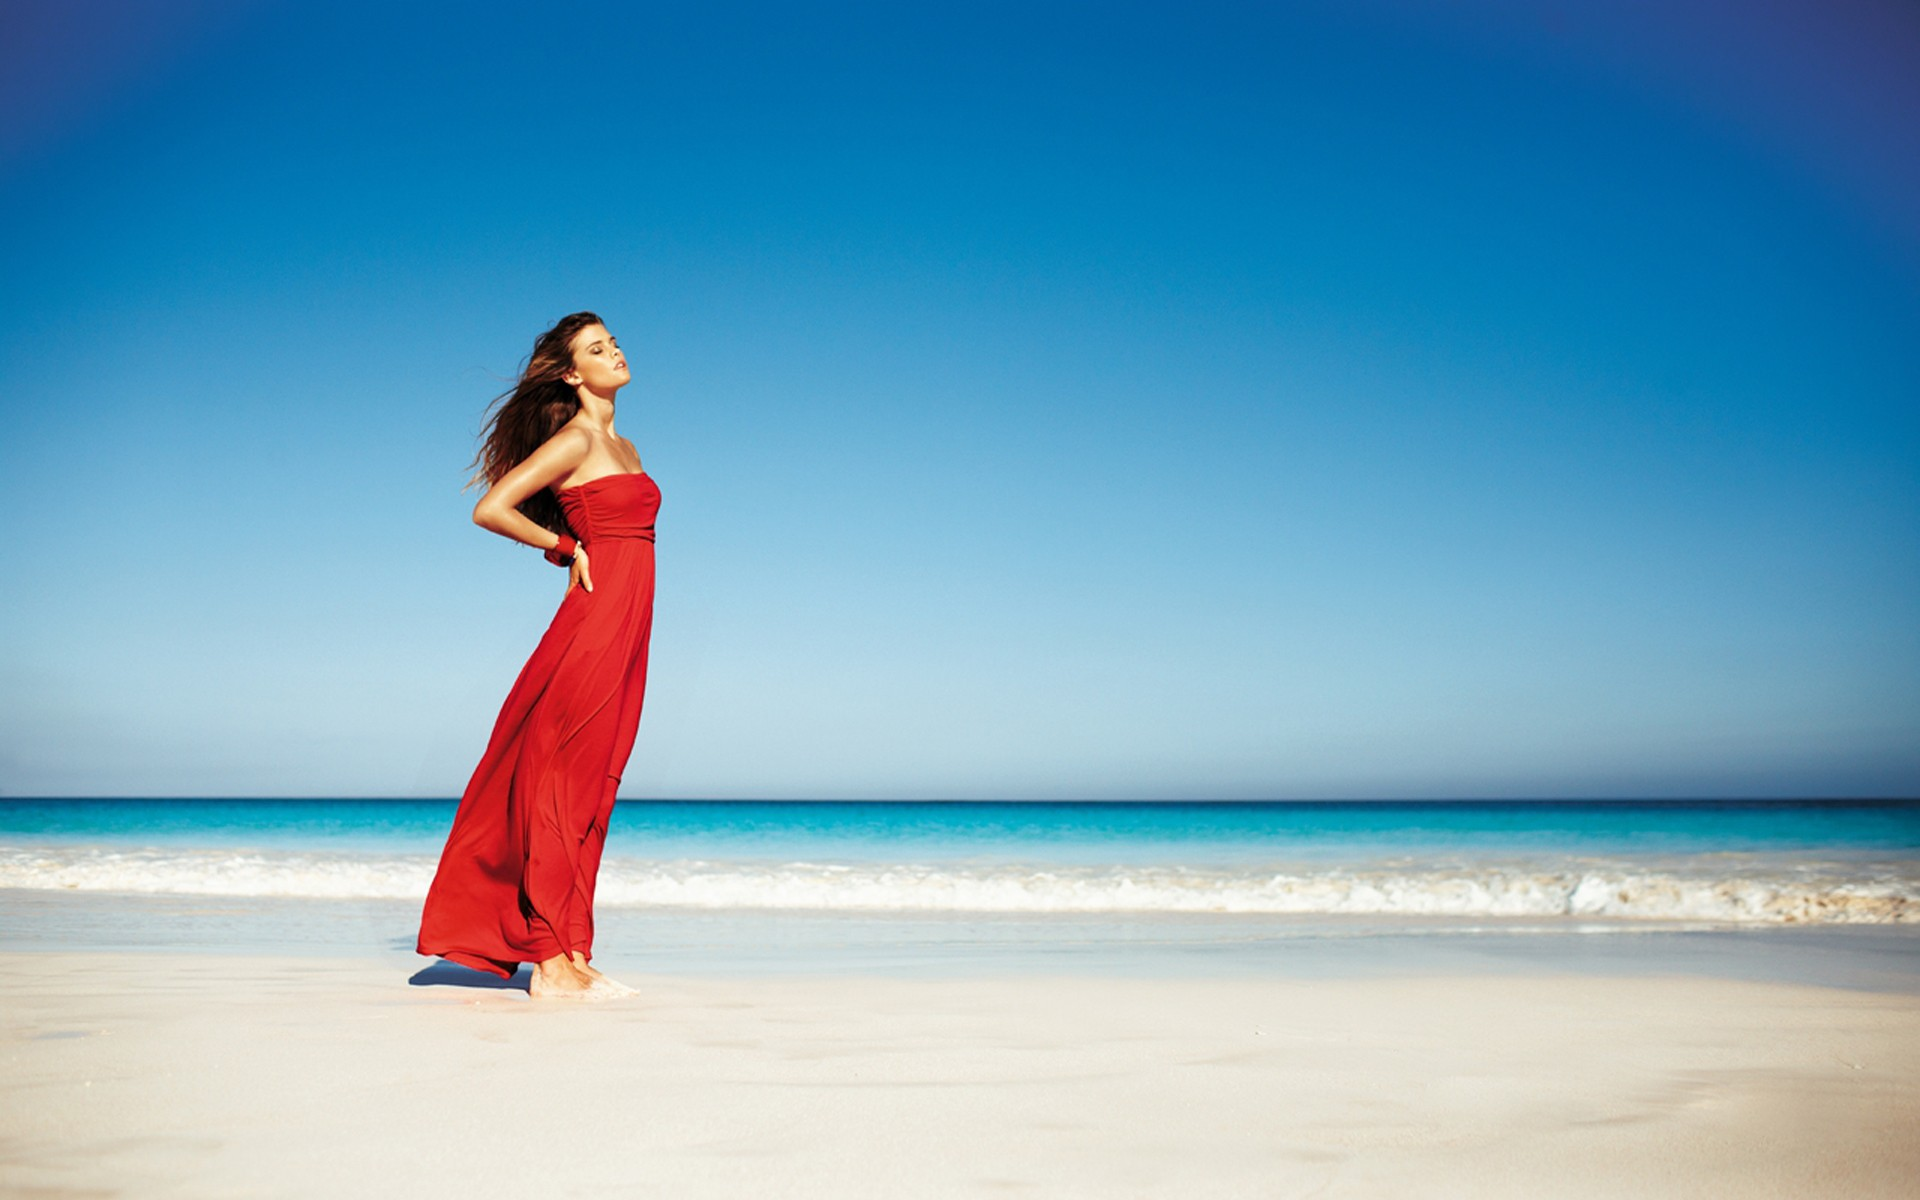 Nina Agdal en la playa - 1920x1200